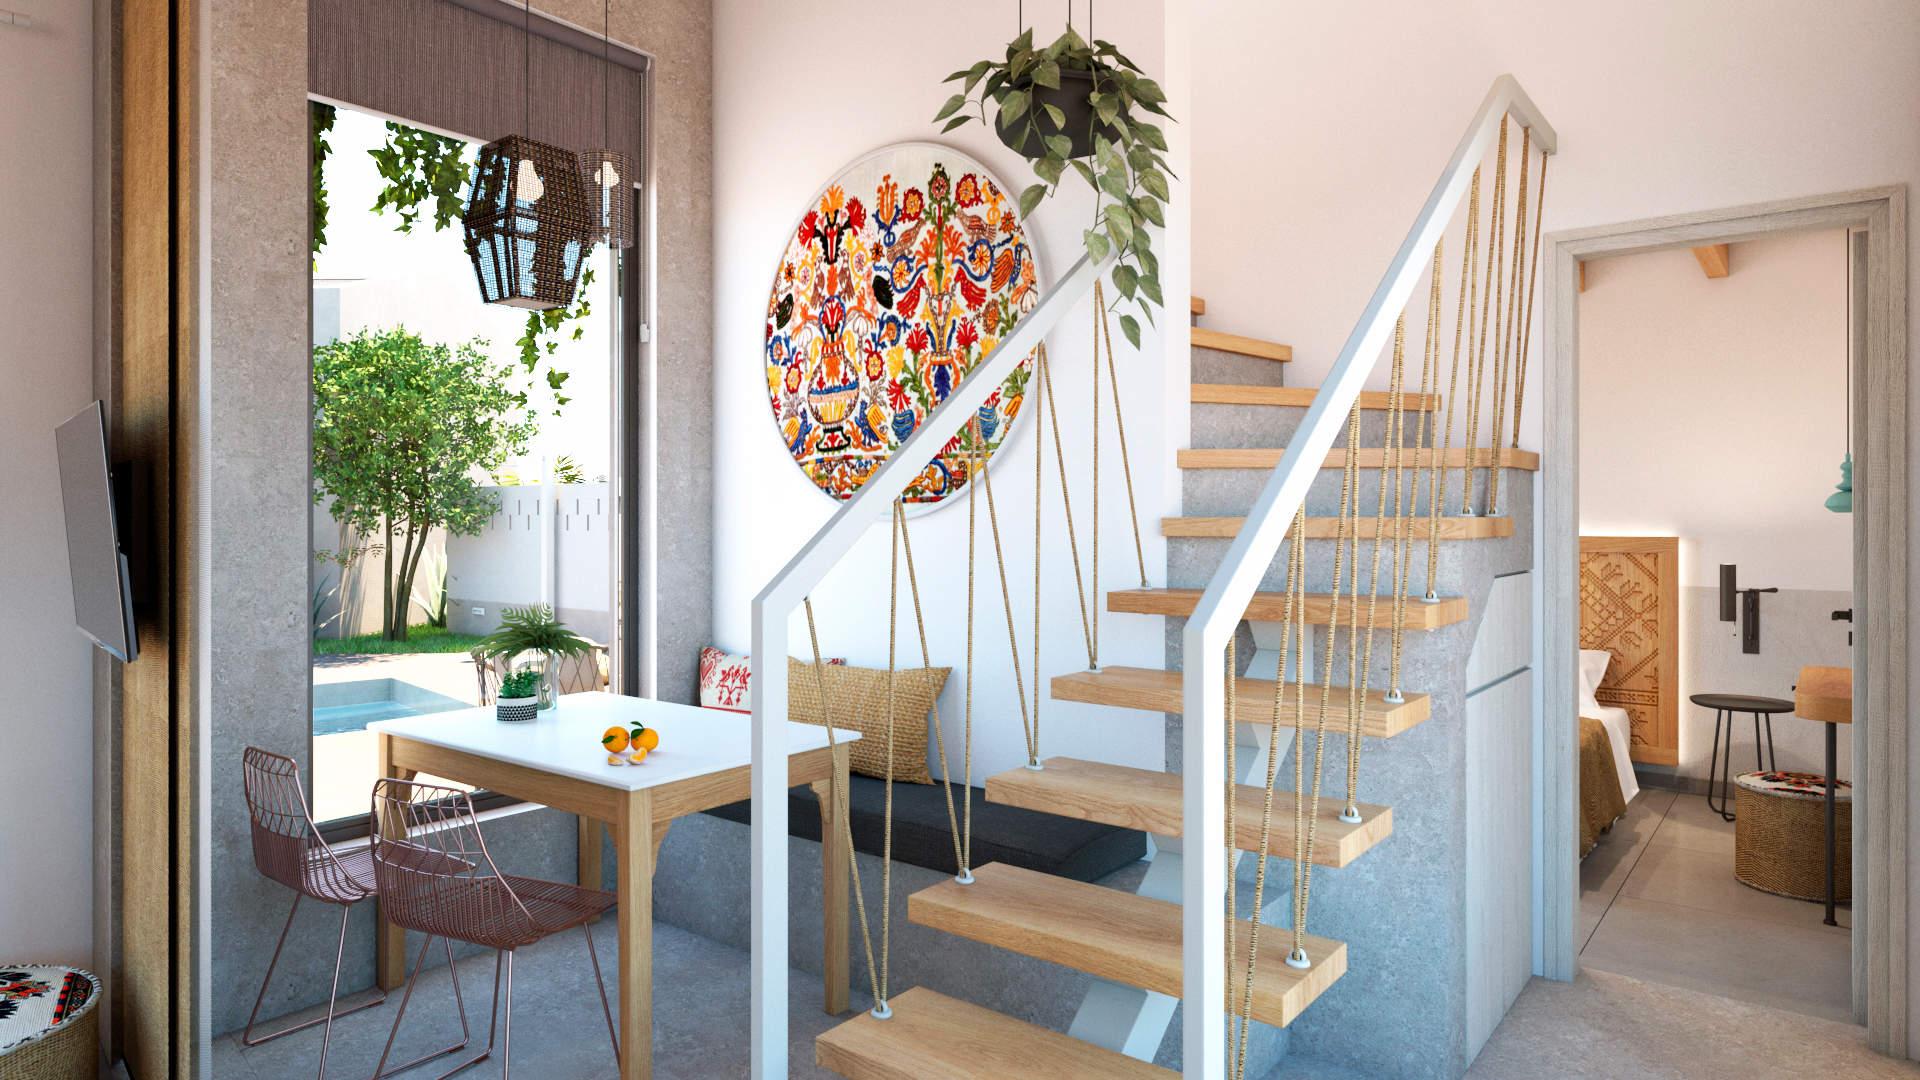 villas complex, interior design, dining room and stairs. Συγκρότημα τουριστικών κατοικιών, εσωτερικός χώρος, τραπεζαρία.